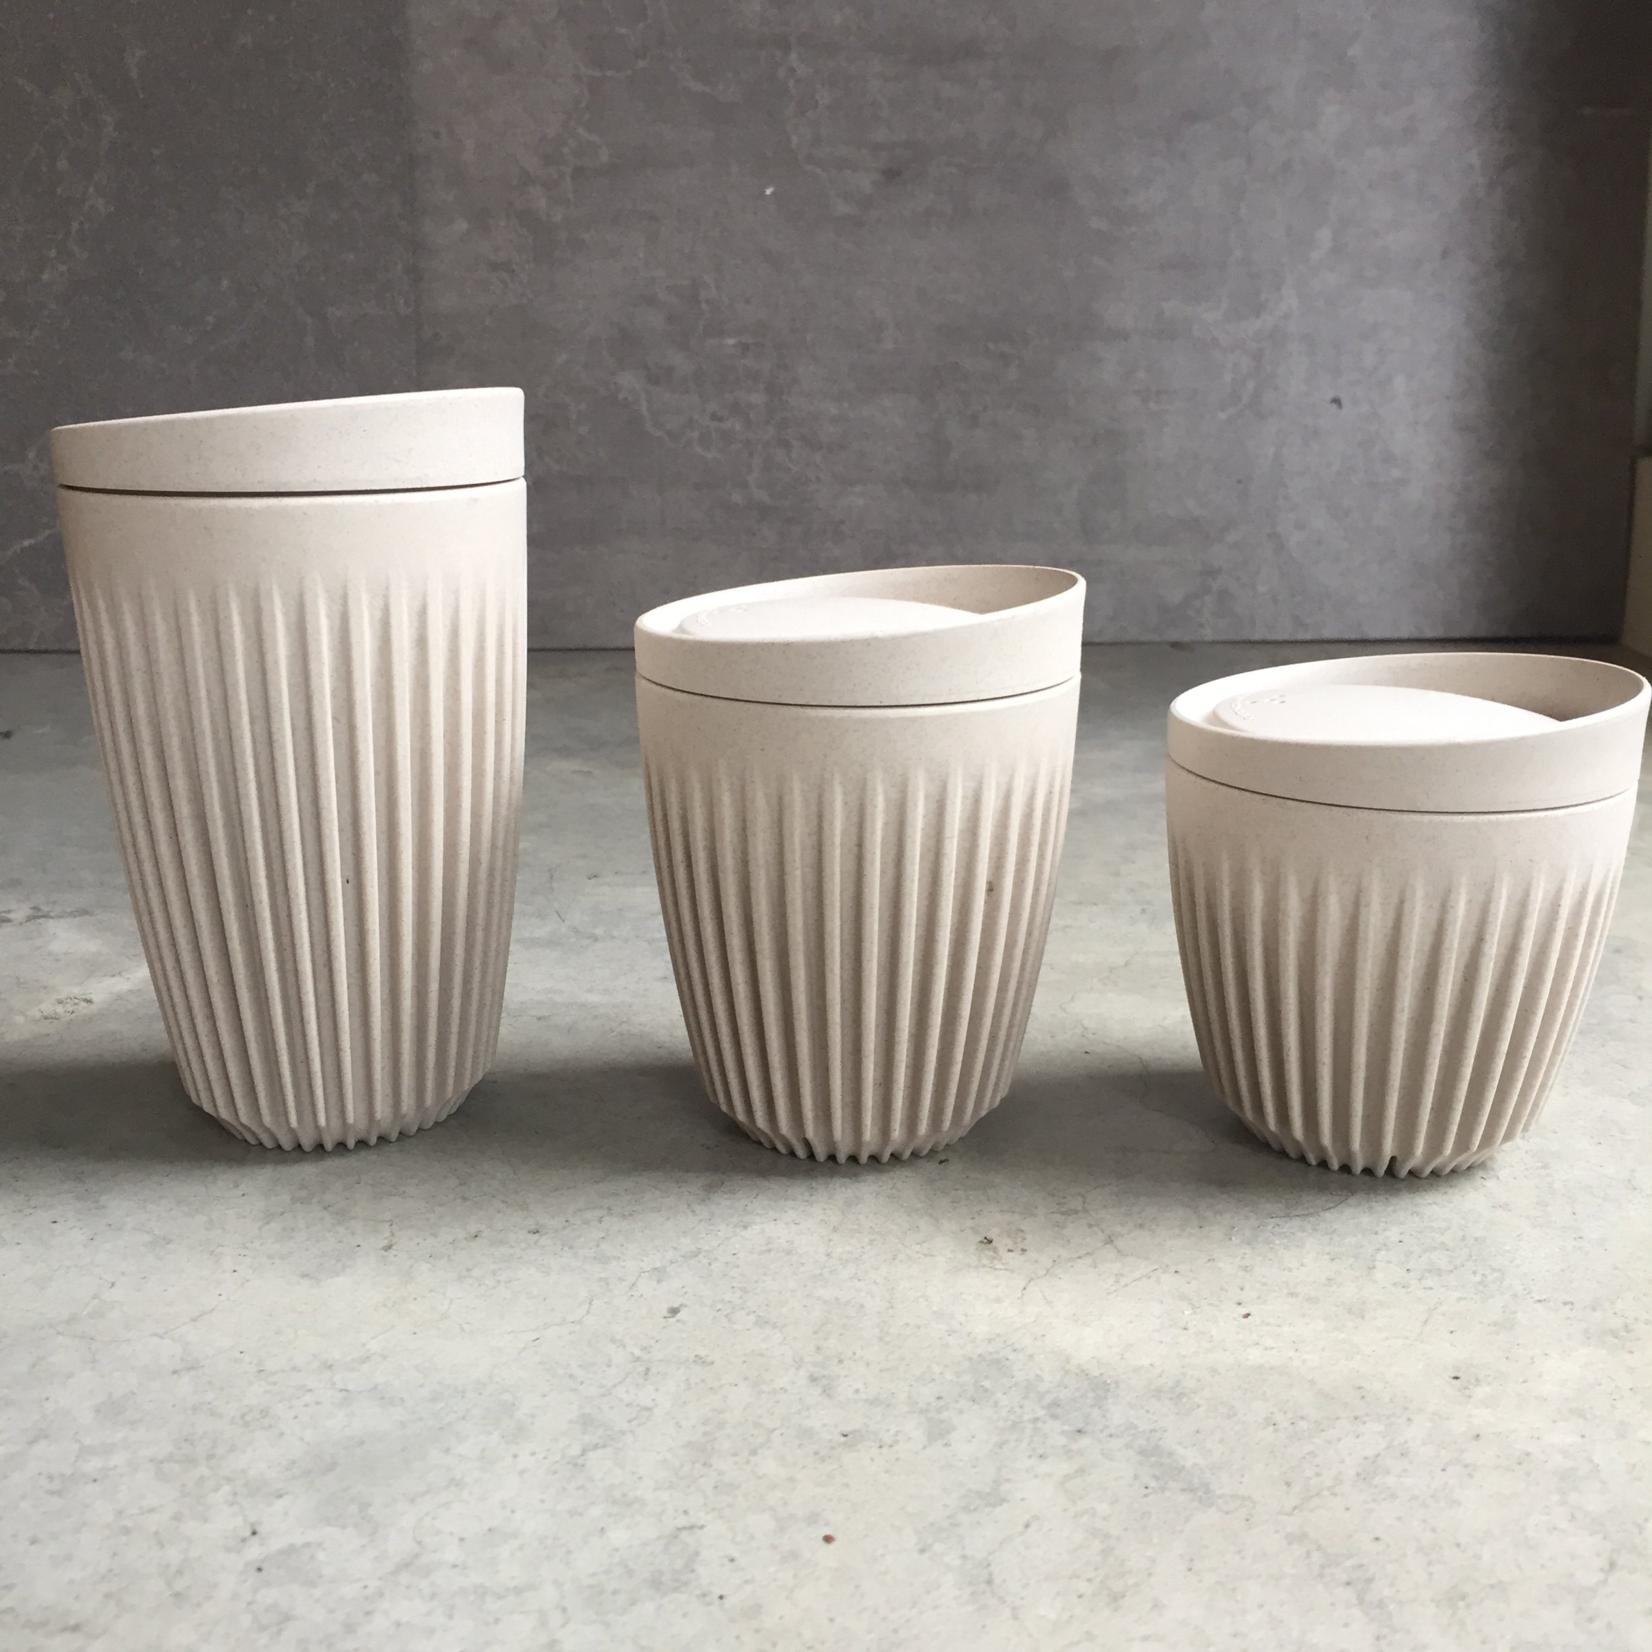 Huskee Huskee Coffee Cup